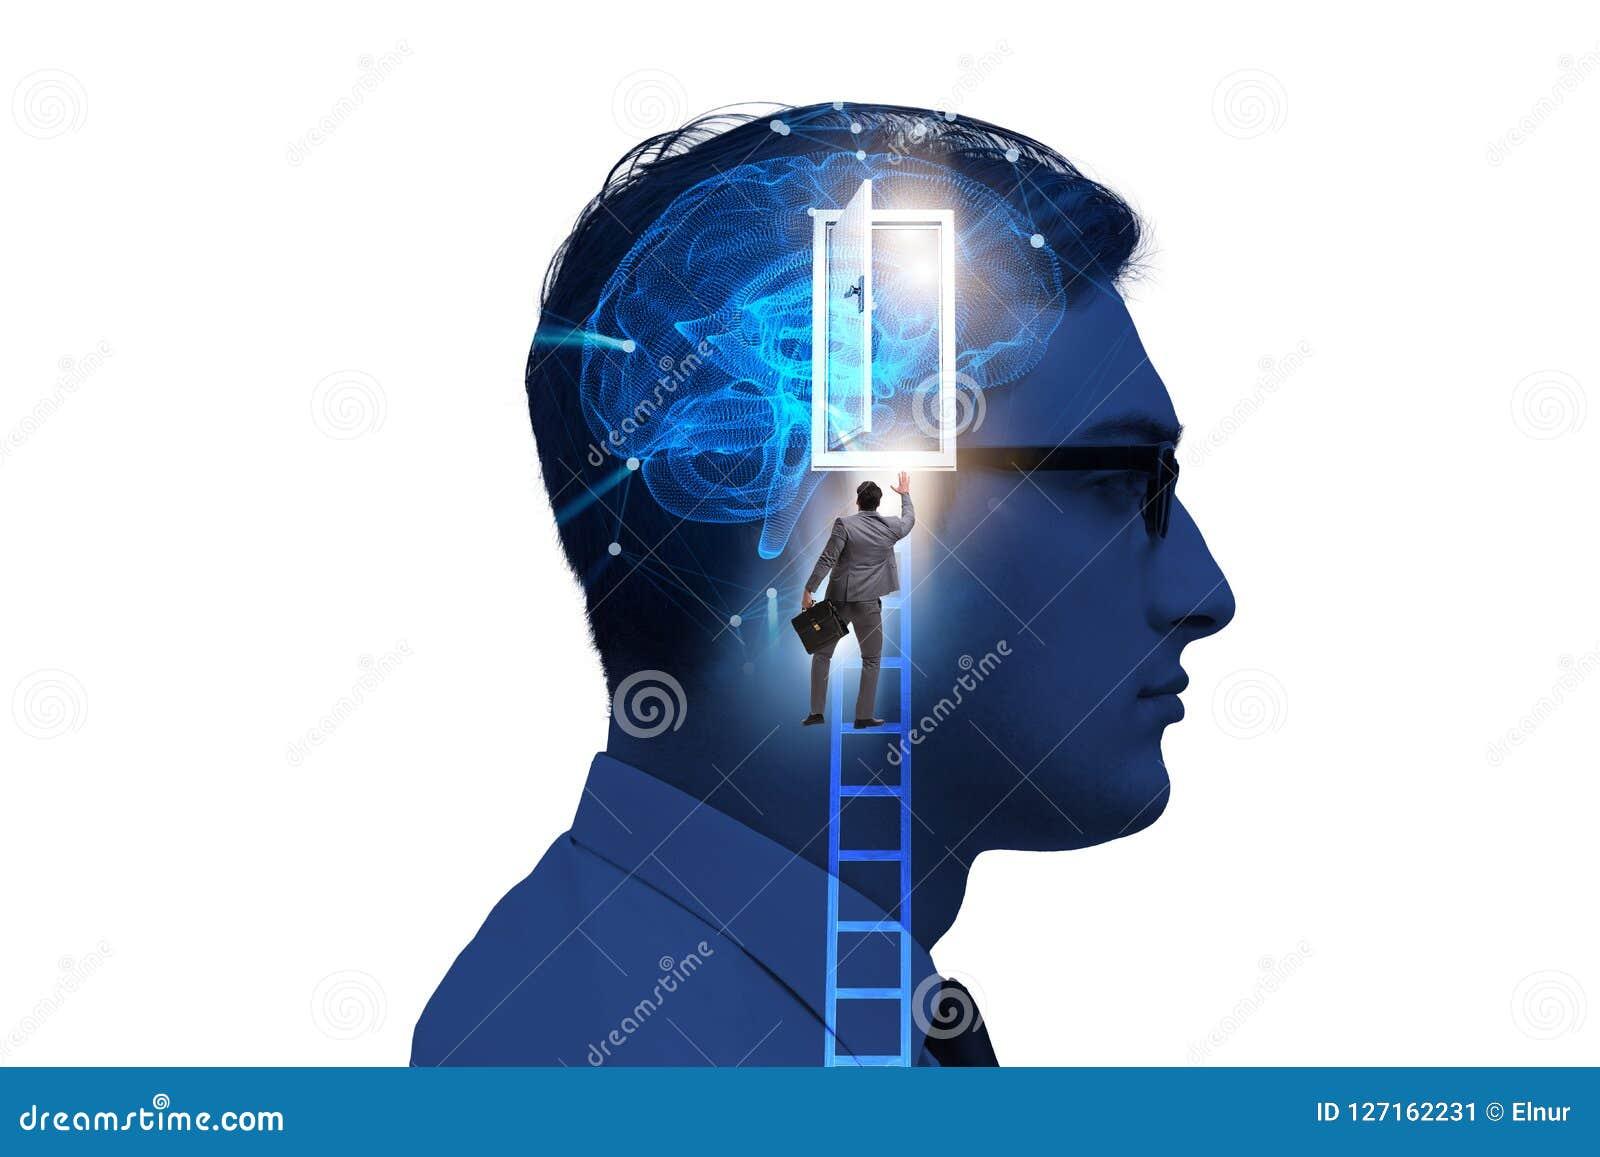 La puerta de abertura del hombre de negocios a la inteligencia artificial